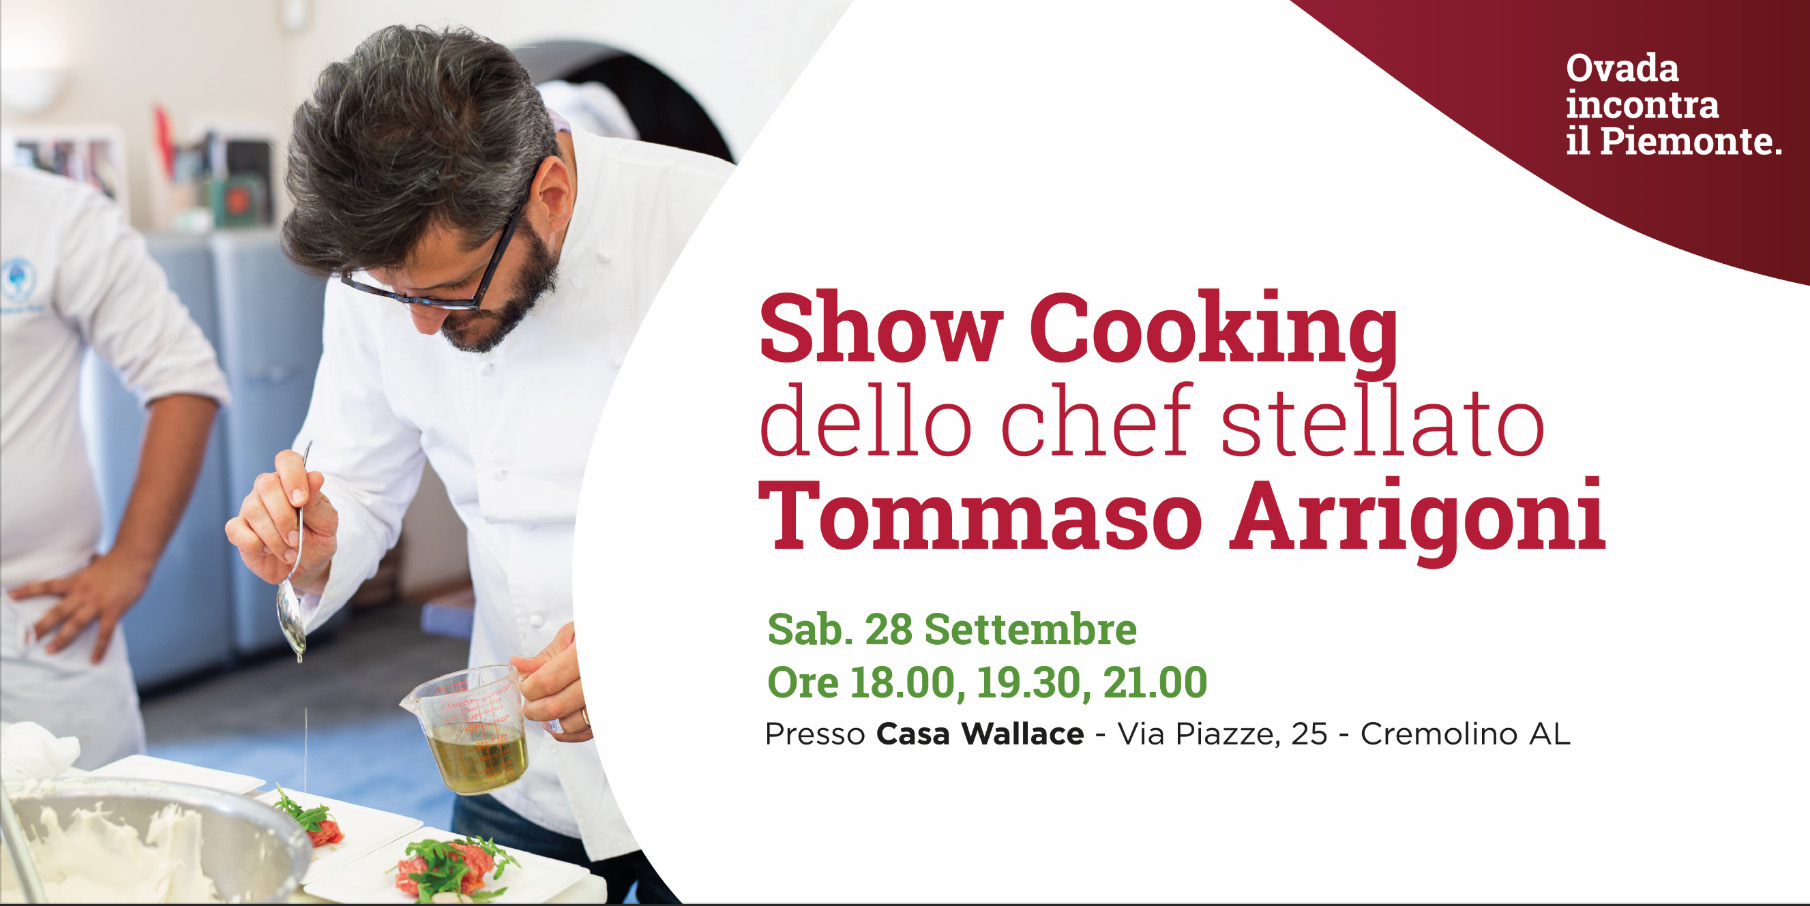 Biglietto Showcooking Tommaso Arrigoni